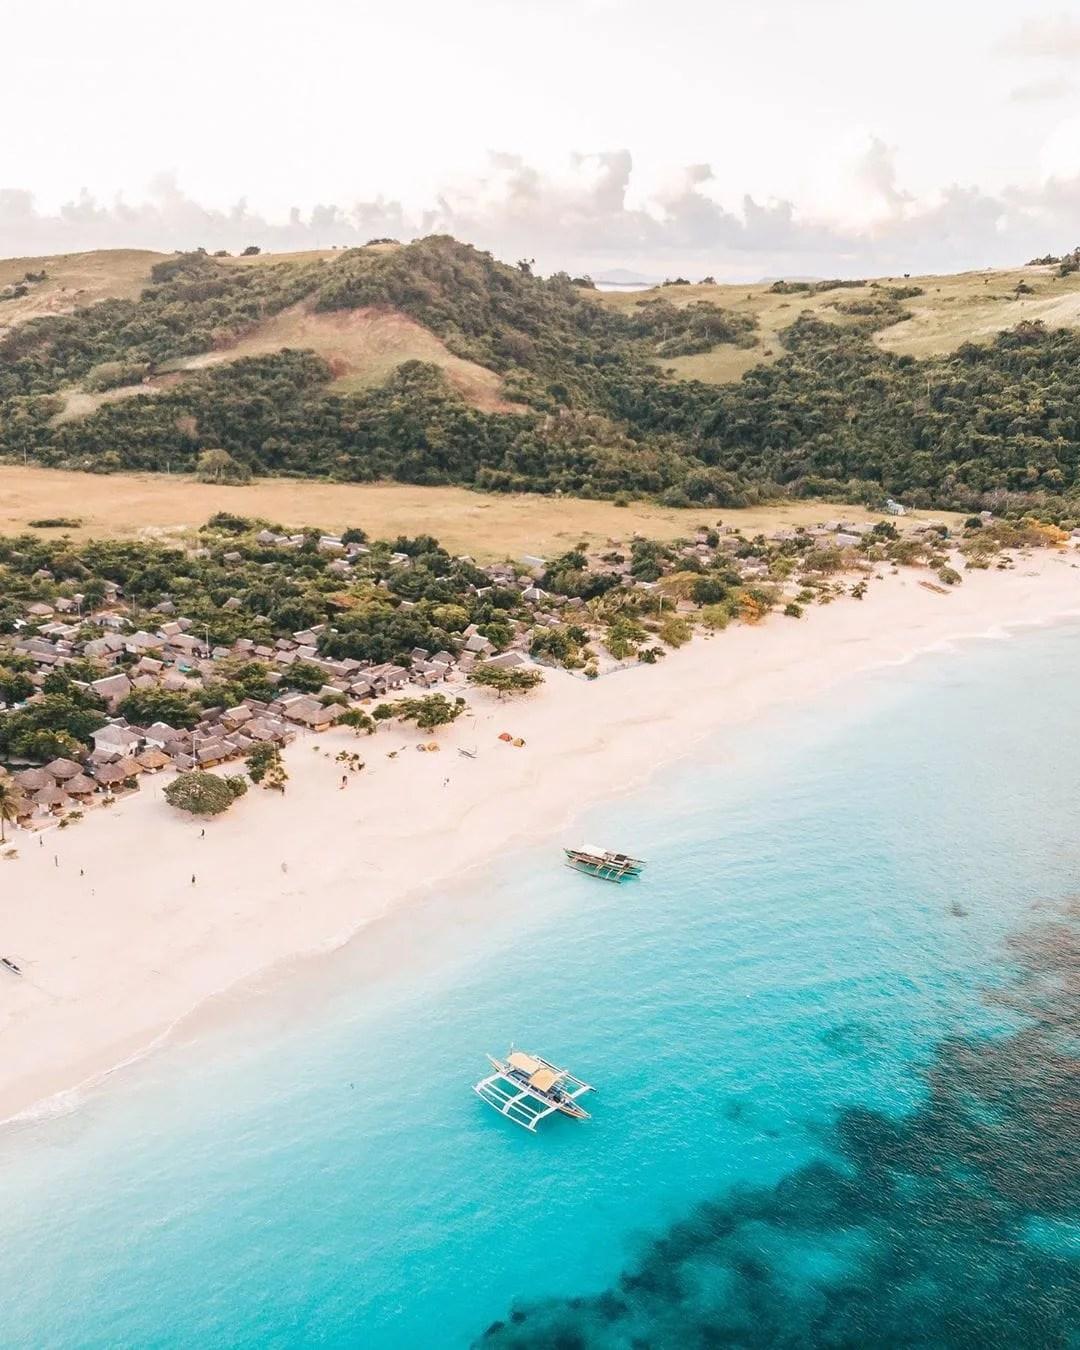 Calaguas Beach, Calaguas Itinerary, Calaguas travel guide, things to do in Calaguas Island, where to stay in Calaguas Island